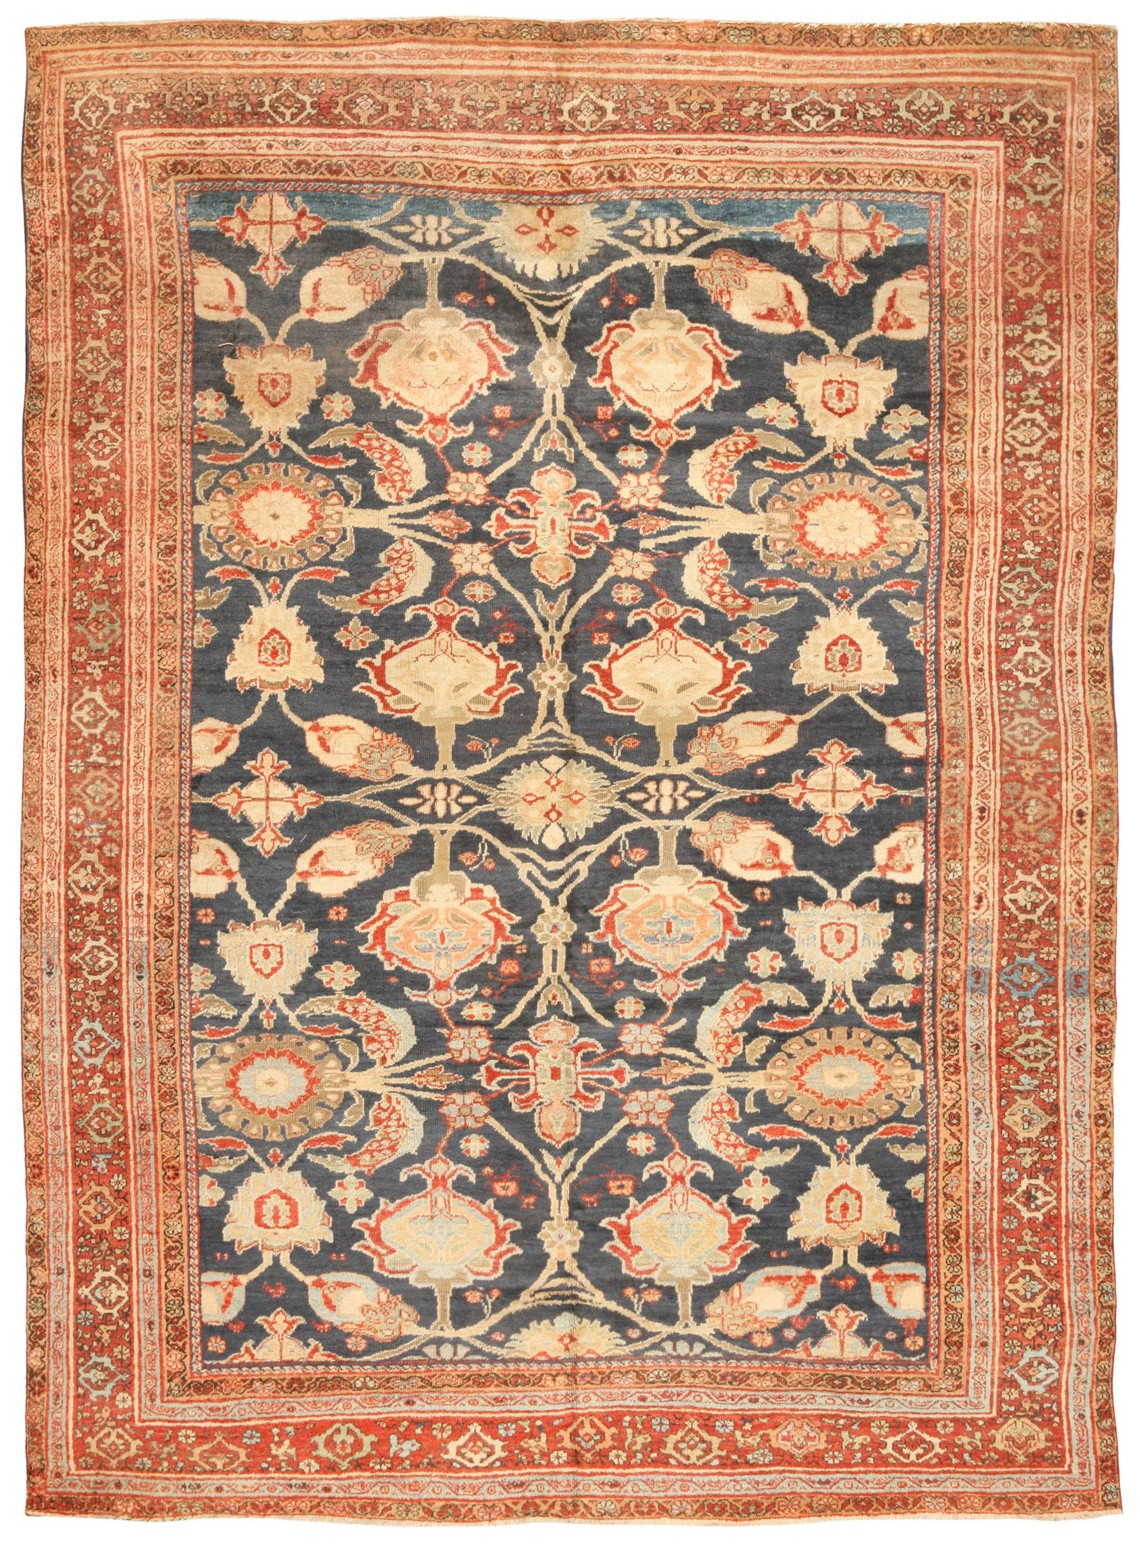 AR40. Sultanabad 7.4 x10.3 c. 1880